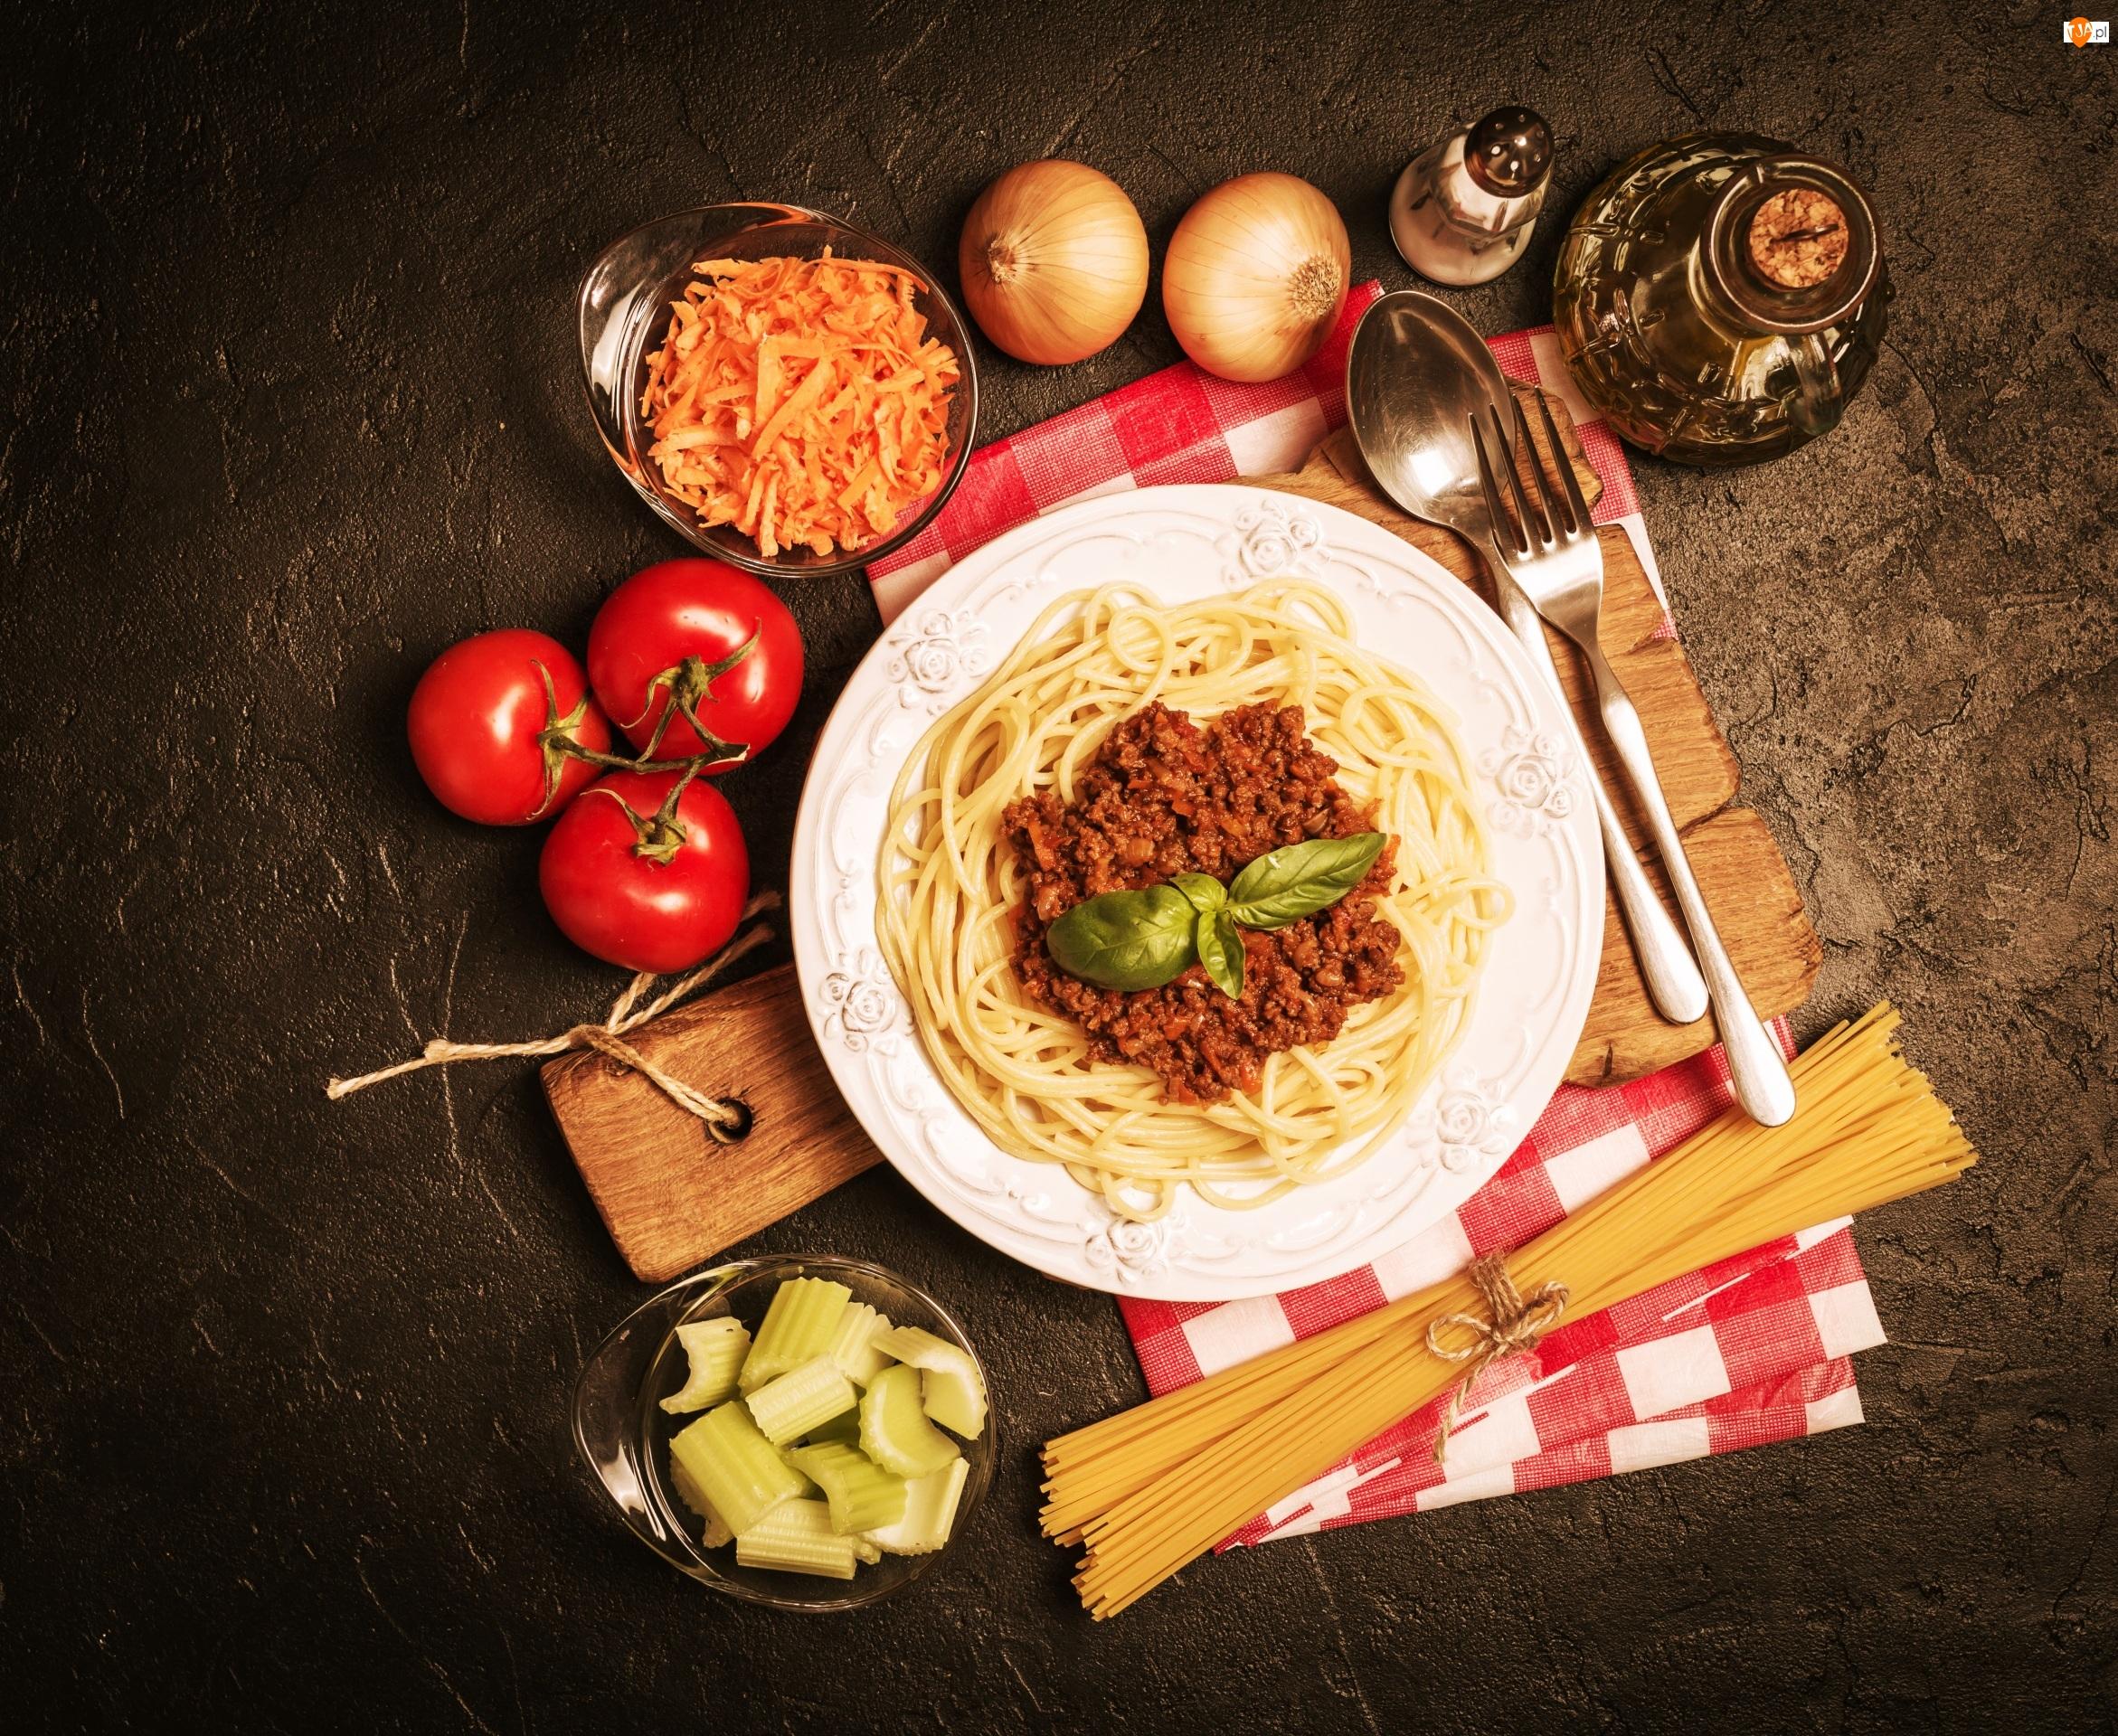 Pomidory, Spaghetti, Talerz, Makaron